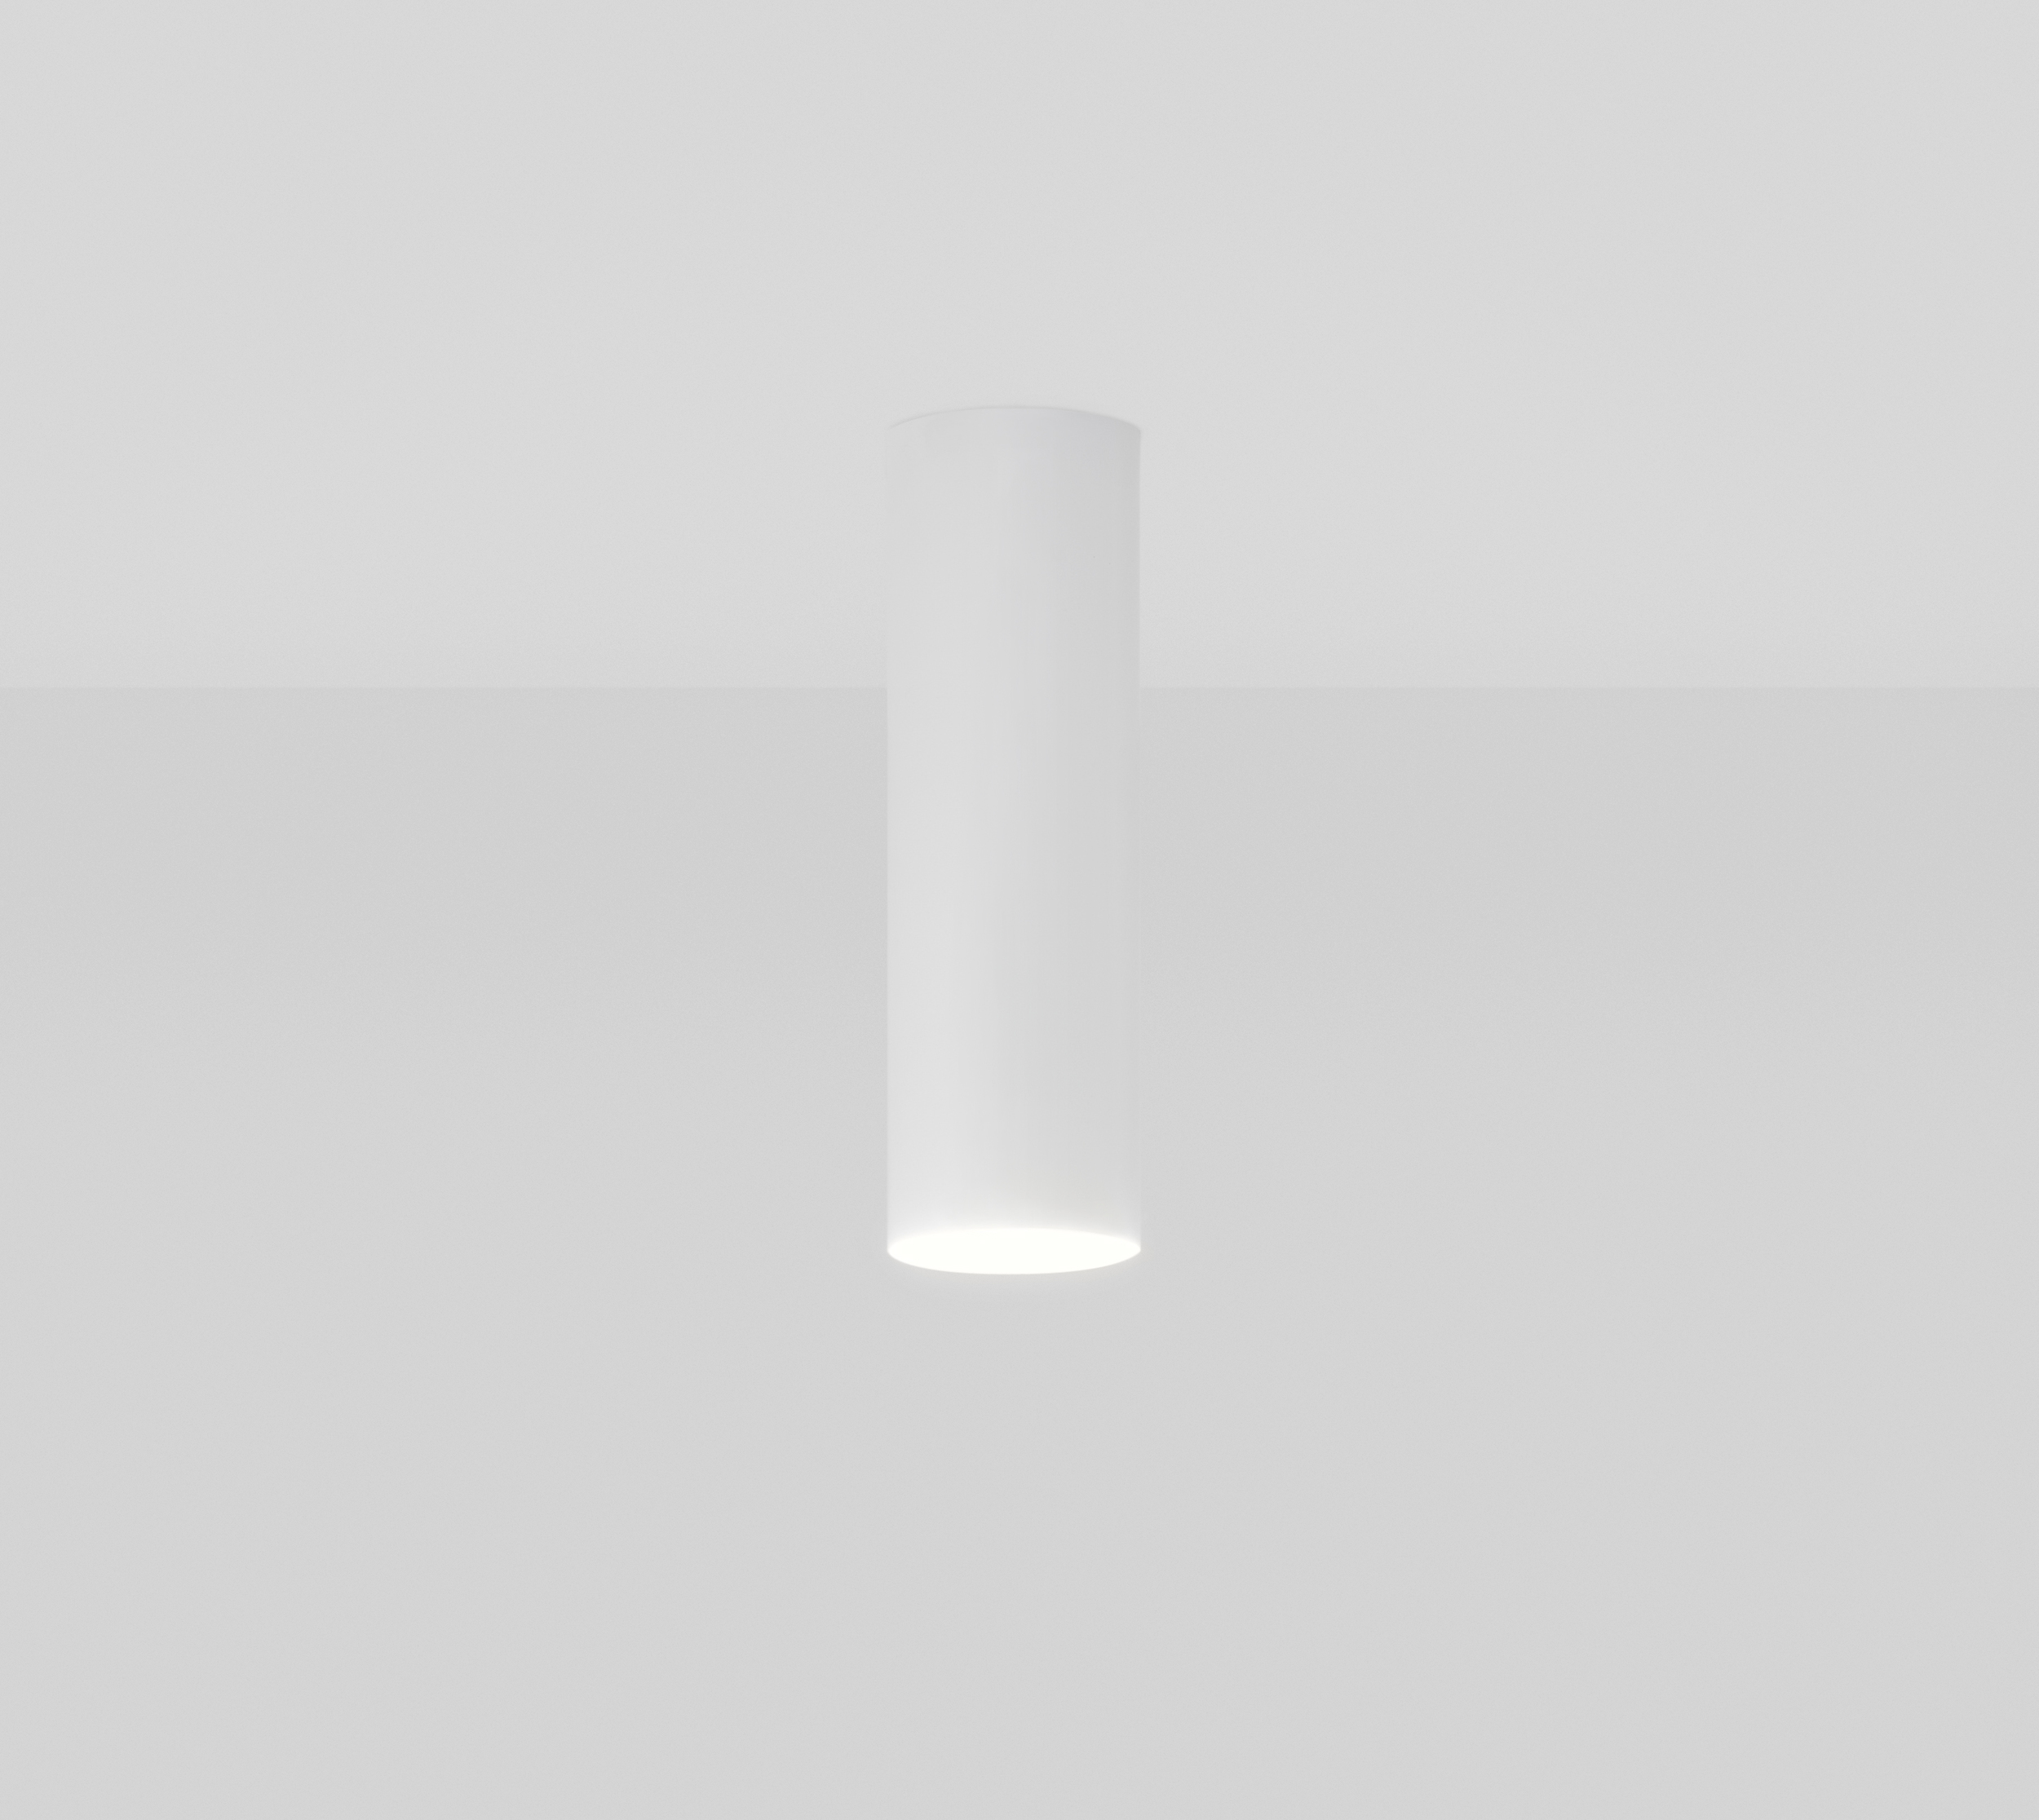 ISM_Can 100_Flat White.jpg